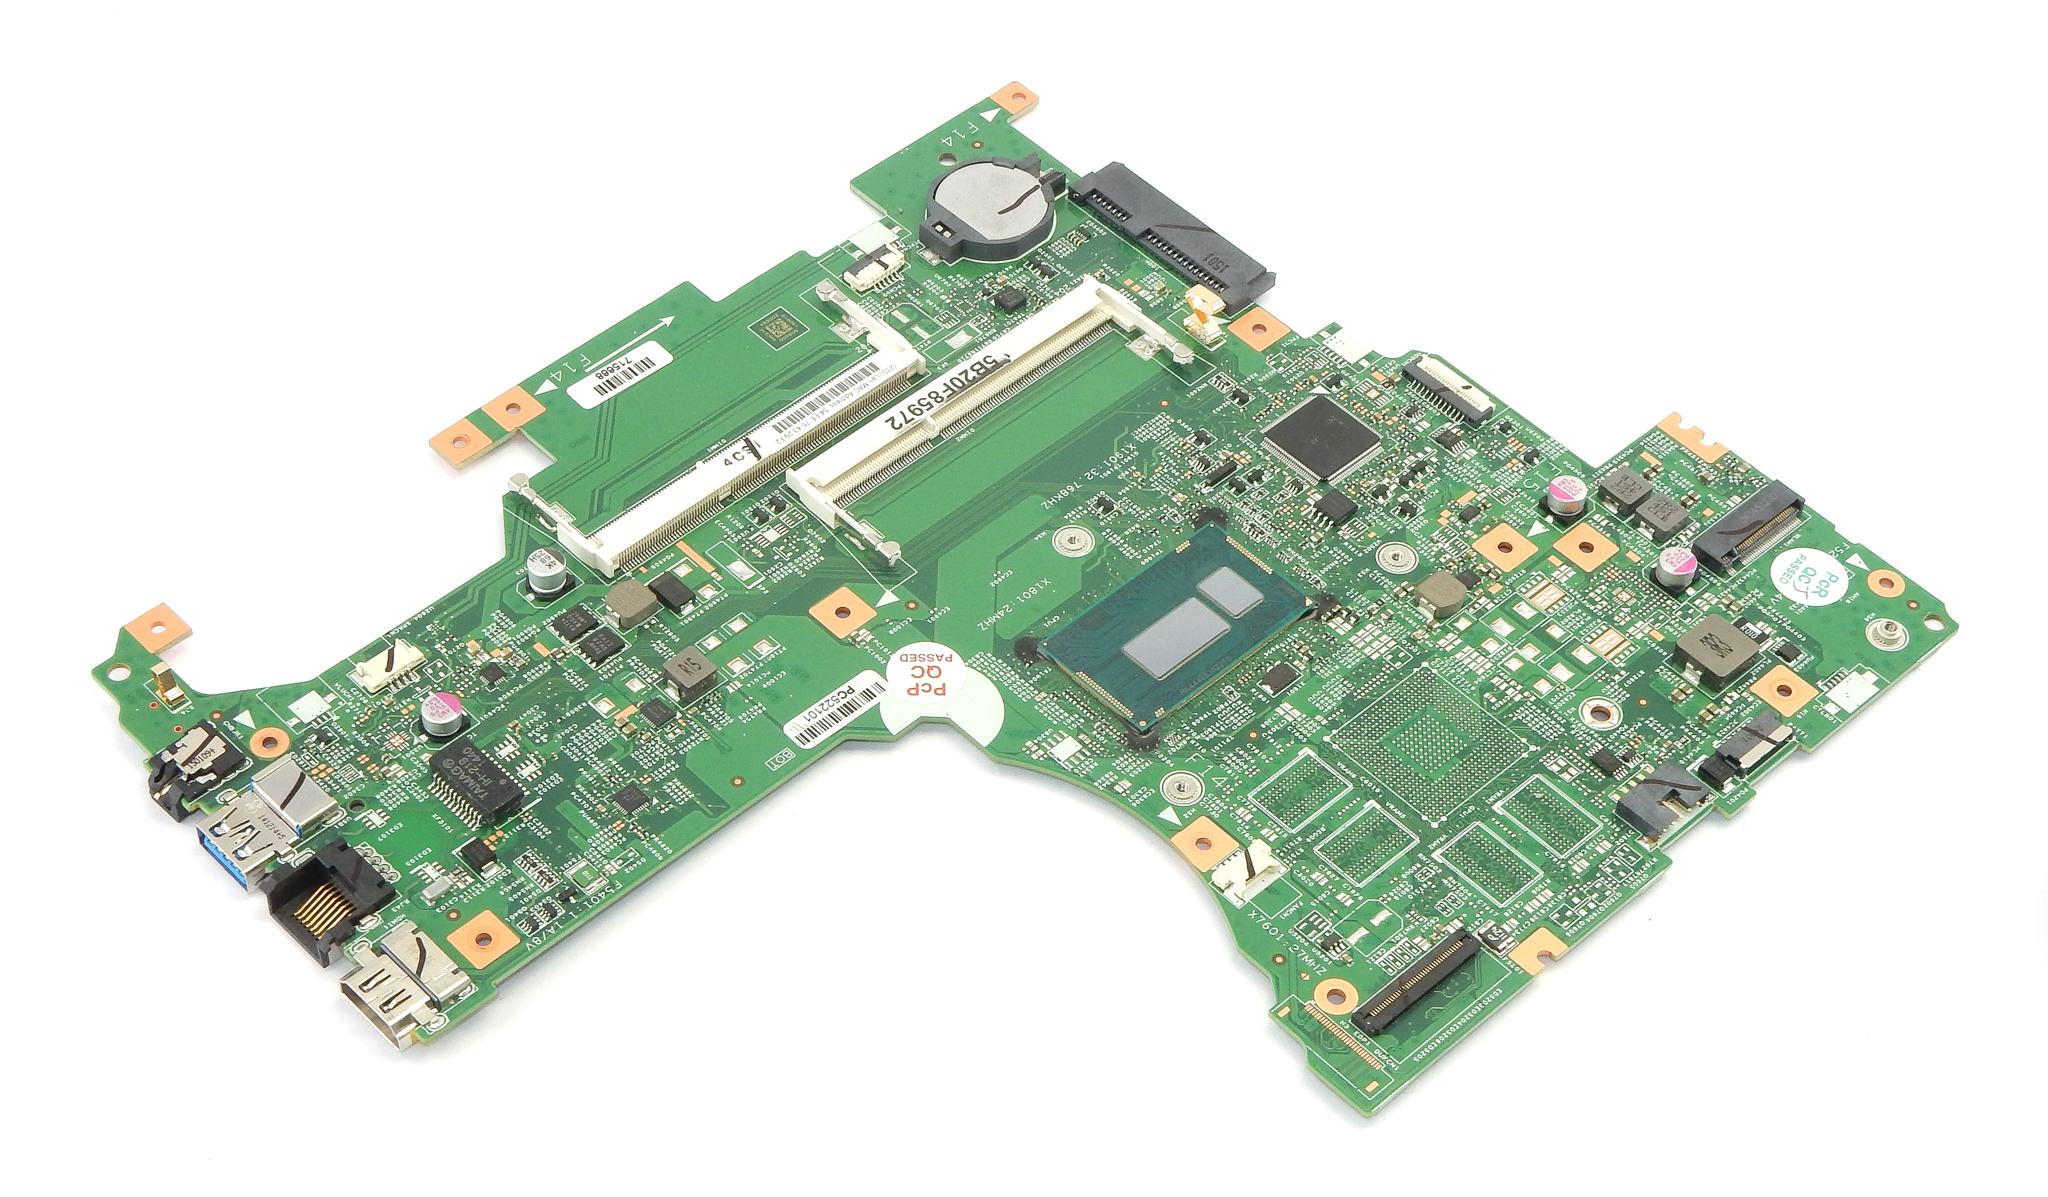 Lenovo 5B20F85972 Flex 2-15 Laptop Motherboard w/ i3-4010U CPU